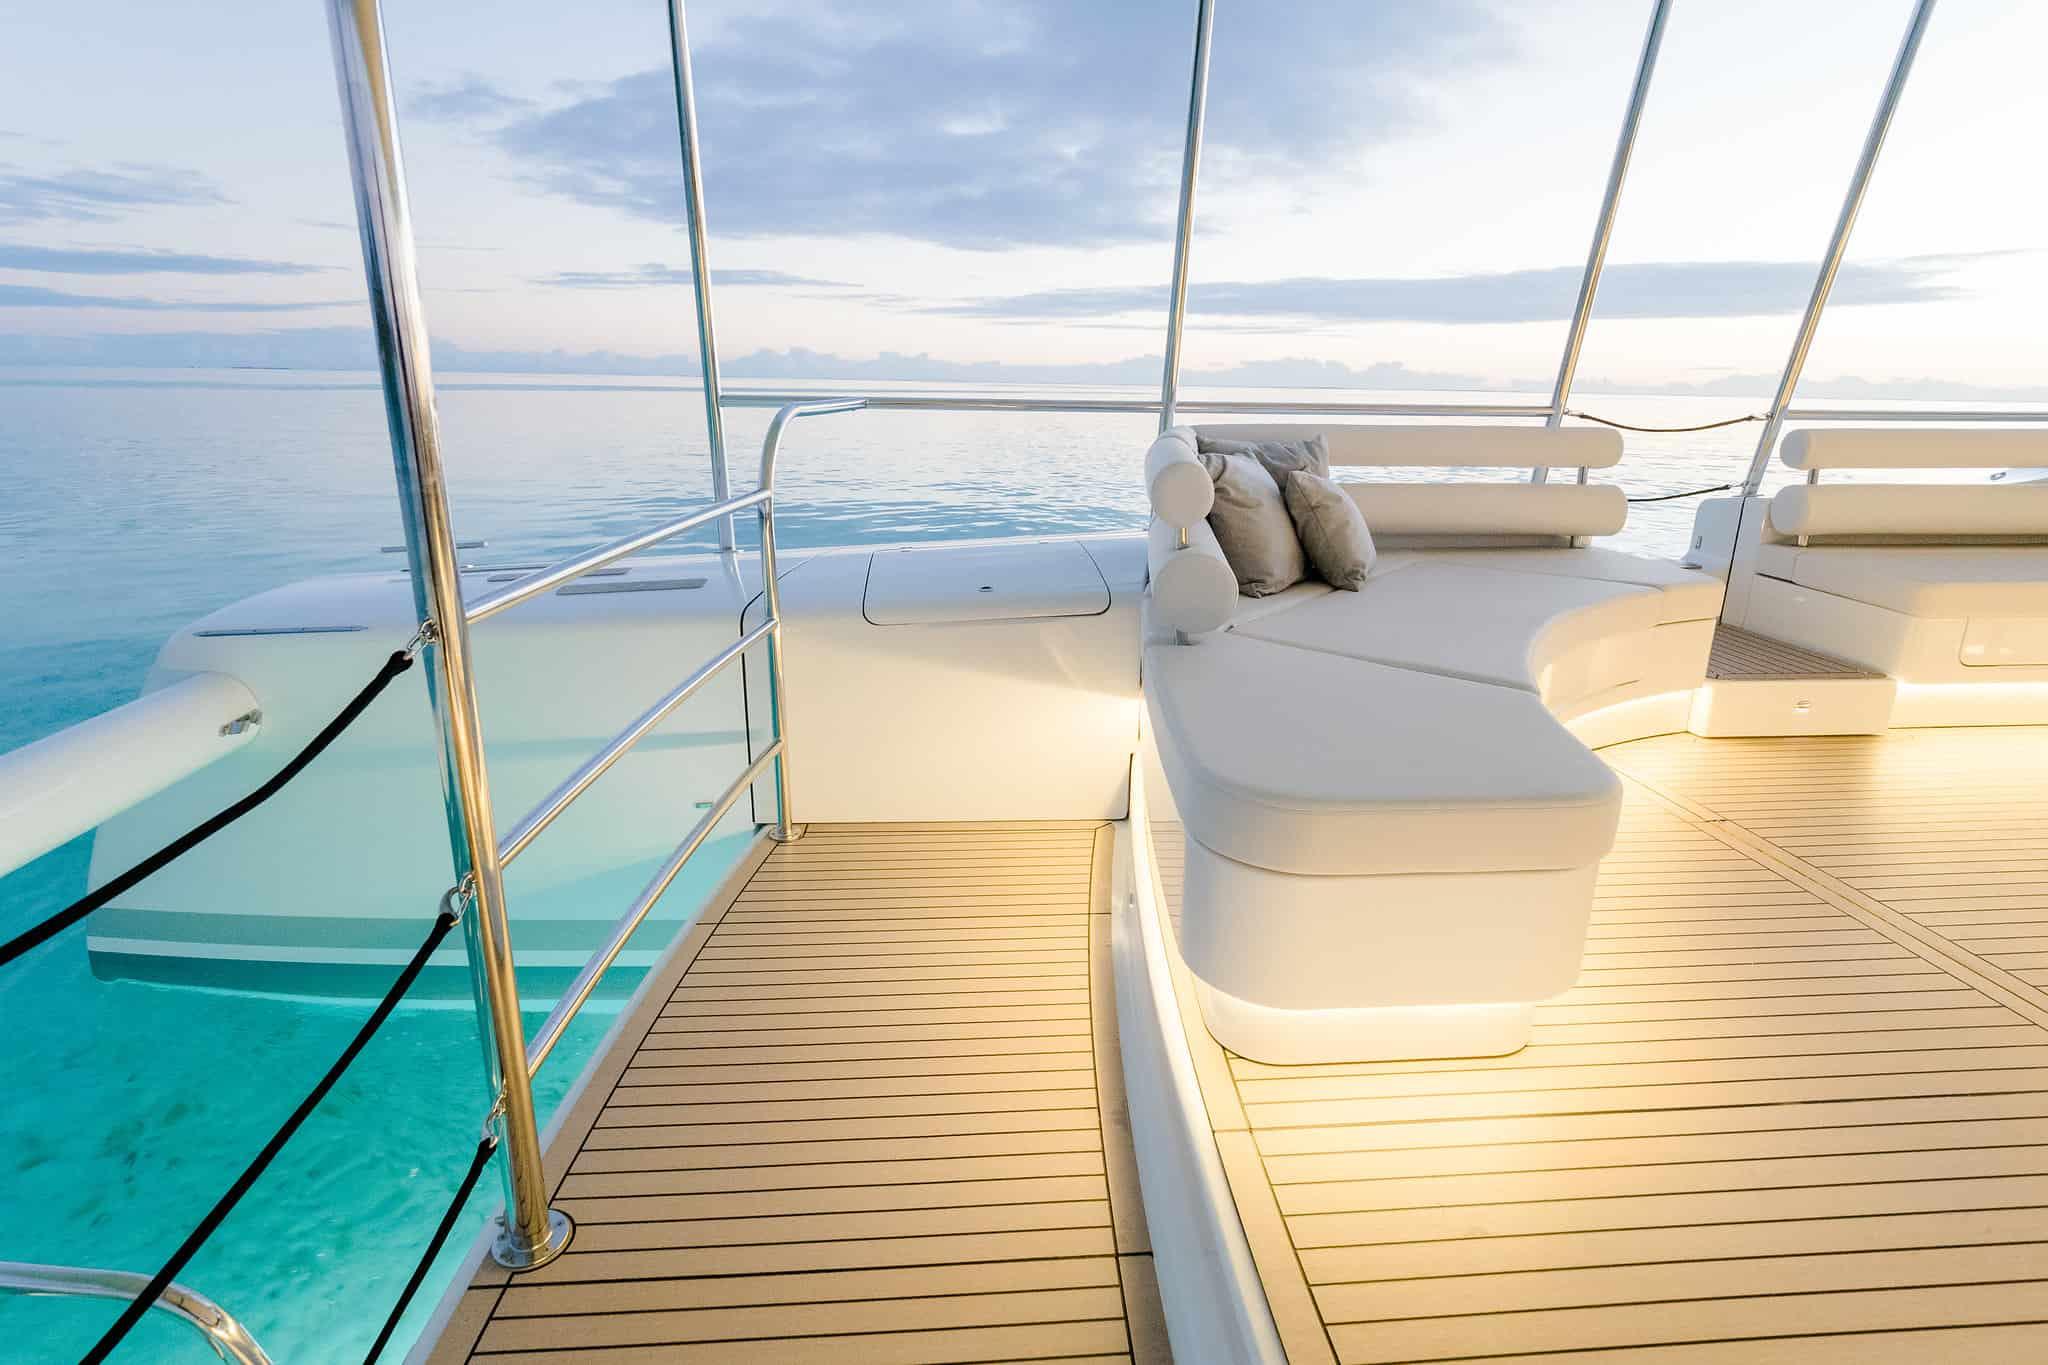 Electric boat SoelCat 12, called Okeanos Pearl is operating at the Bora Bora Pearl Beach Resort